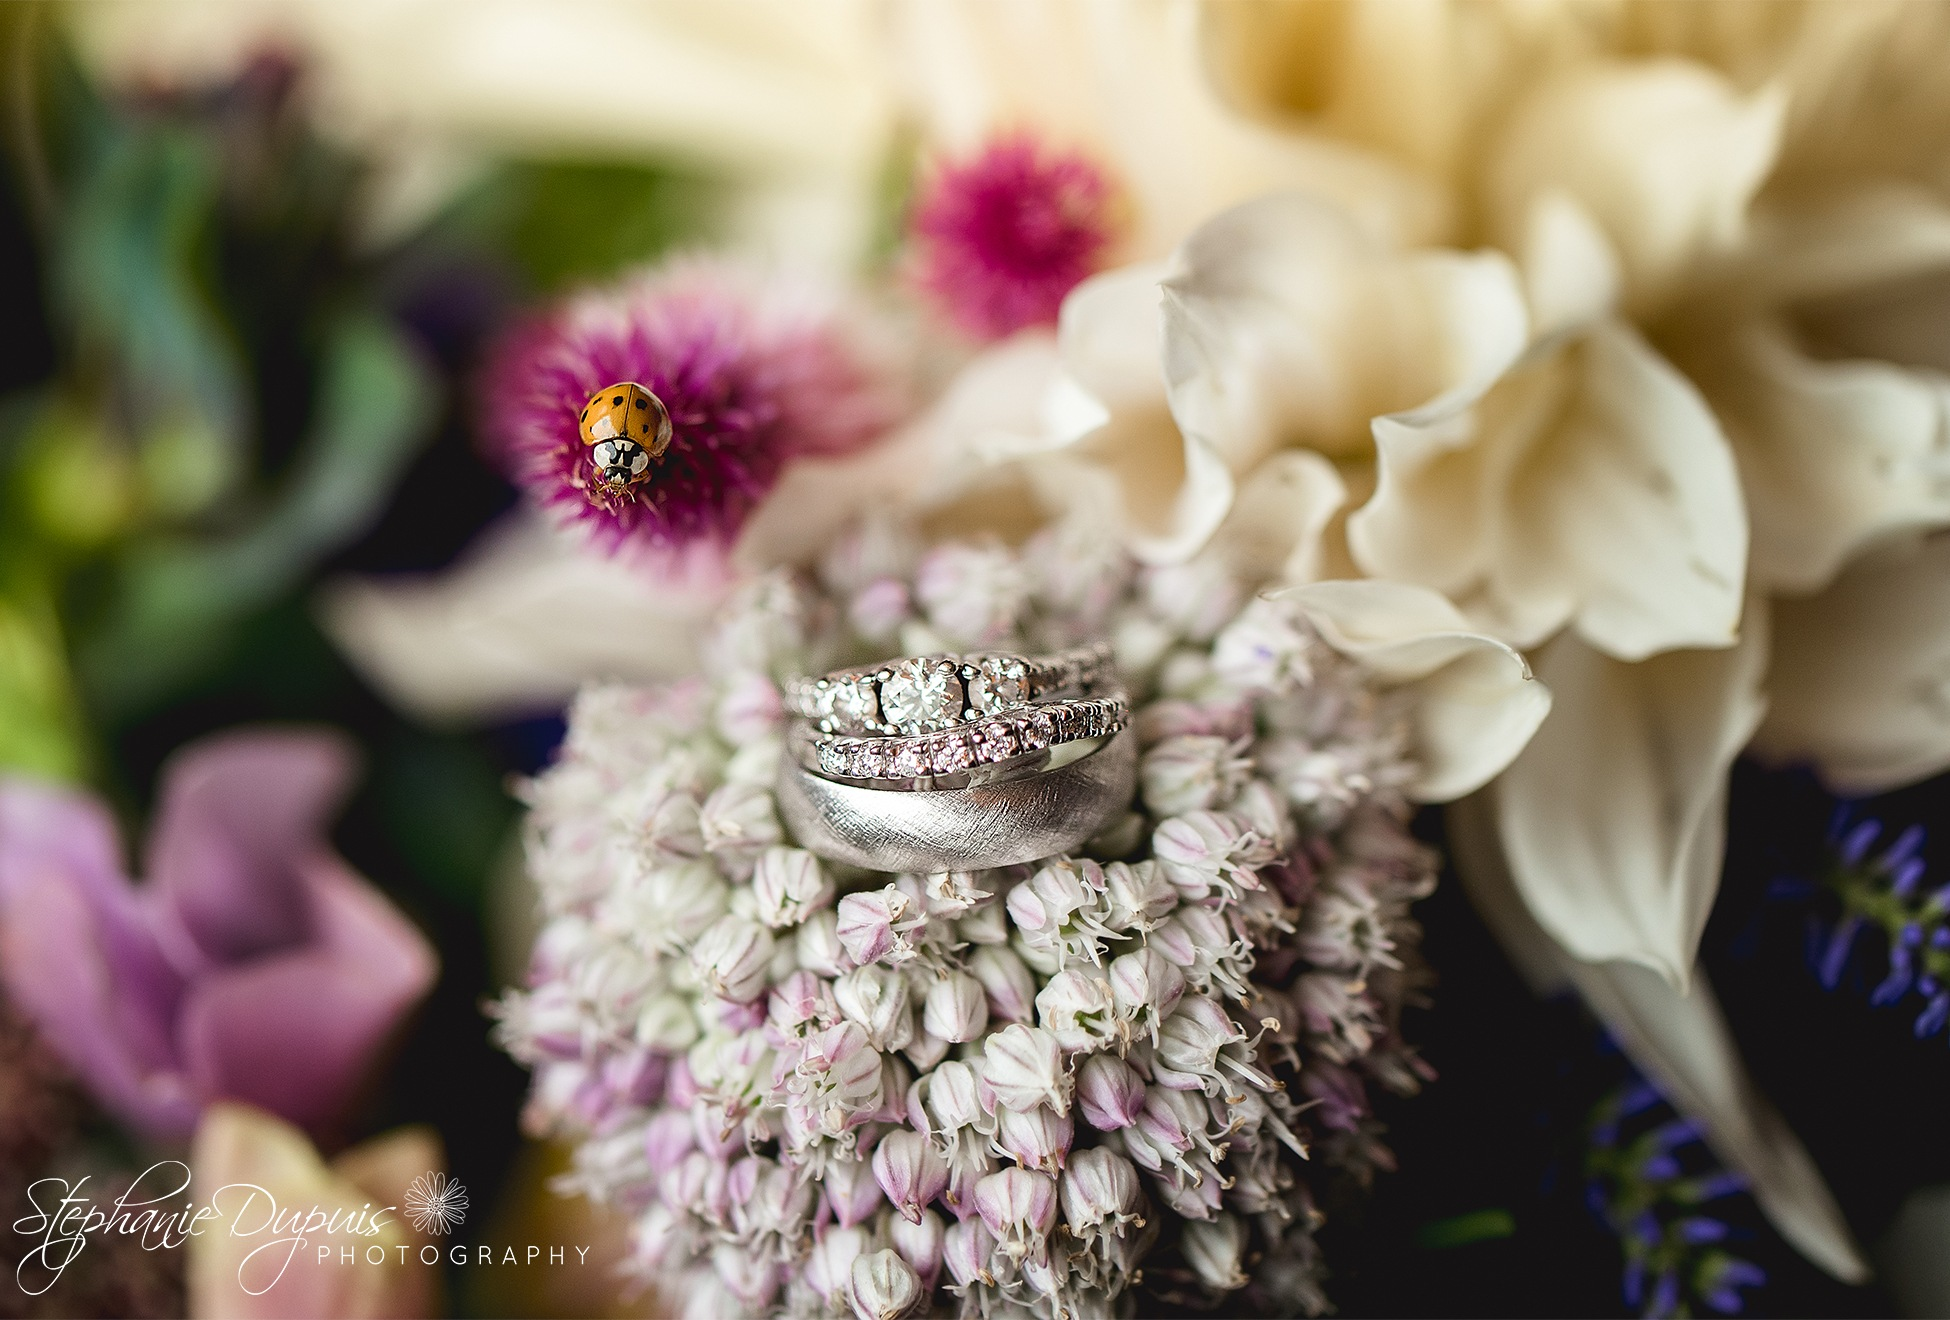 Hicks Wedding 2 - Portfolio: Hick's Wedding